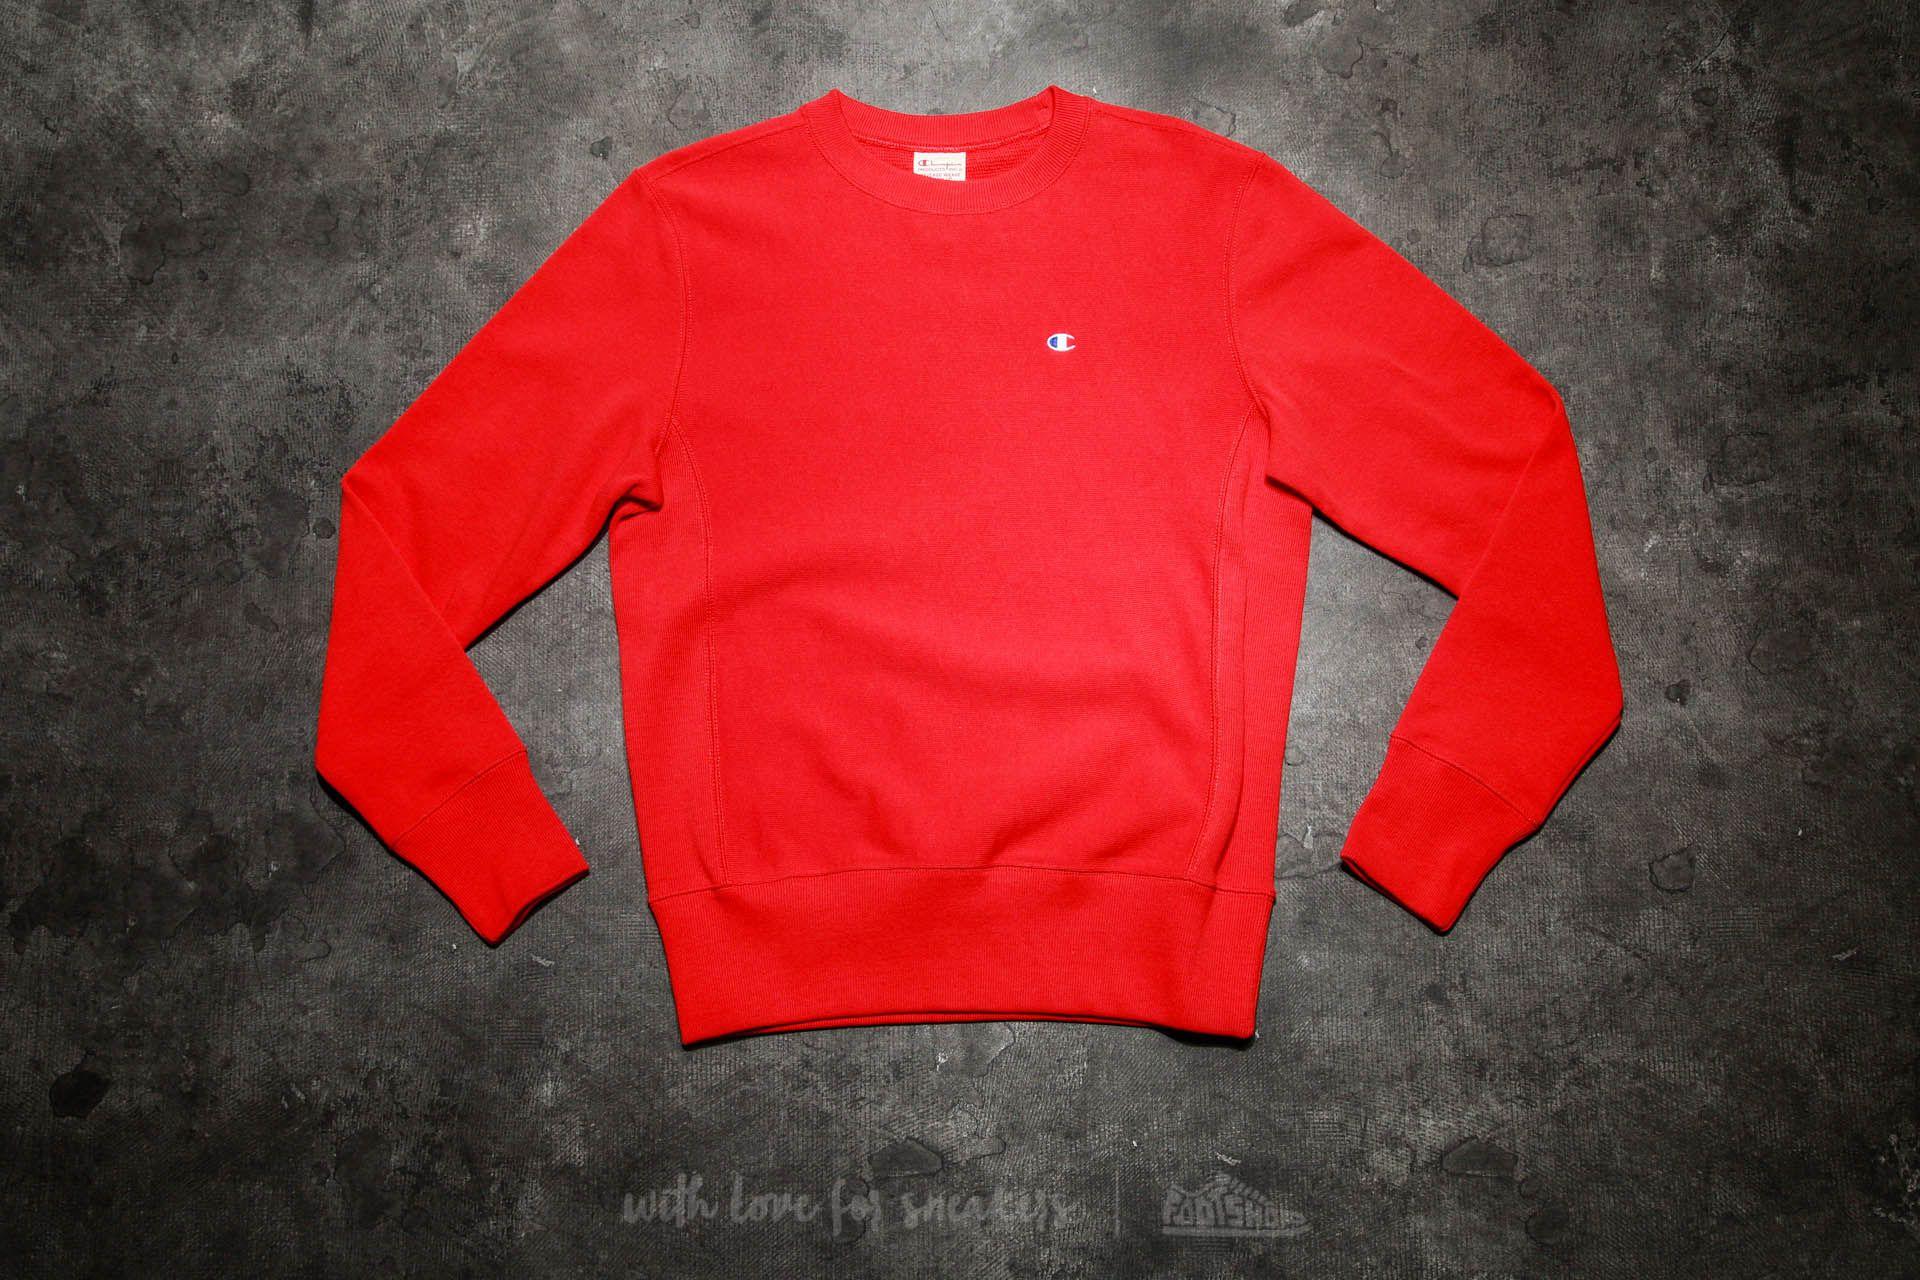 b6f32a97de06 Champion Reverse Weave Crewneck Sweatshirt Red